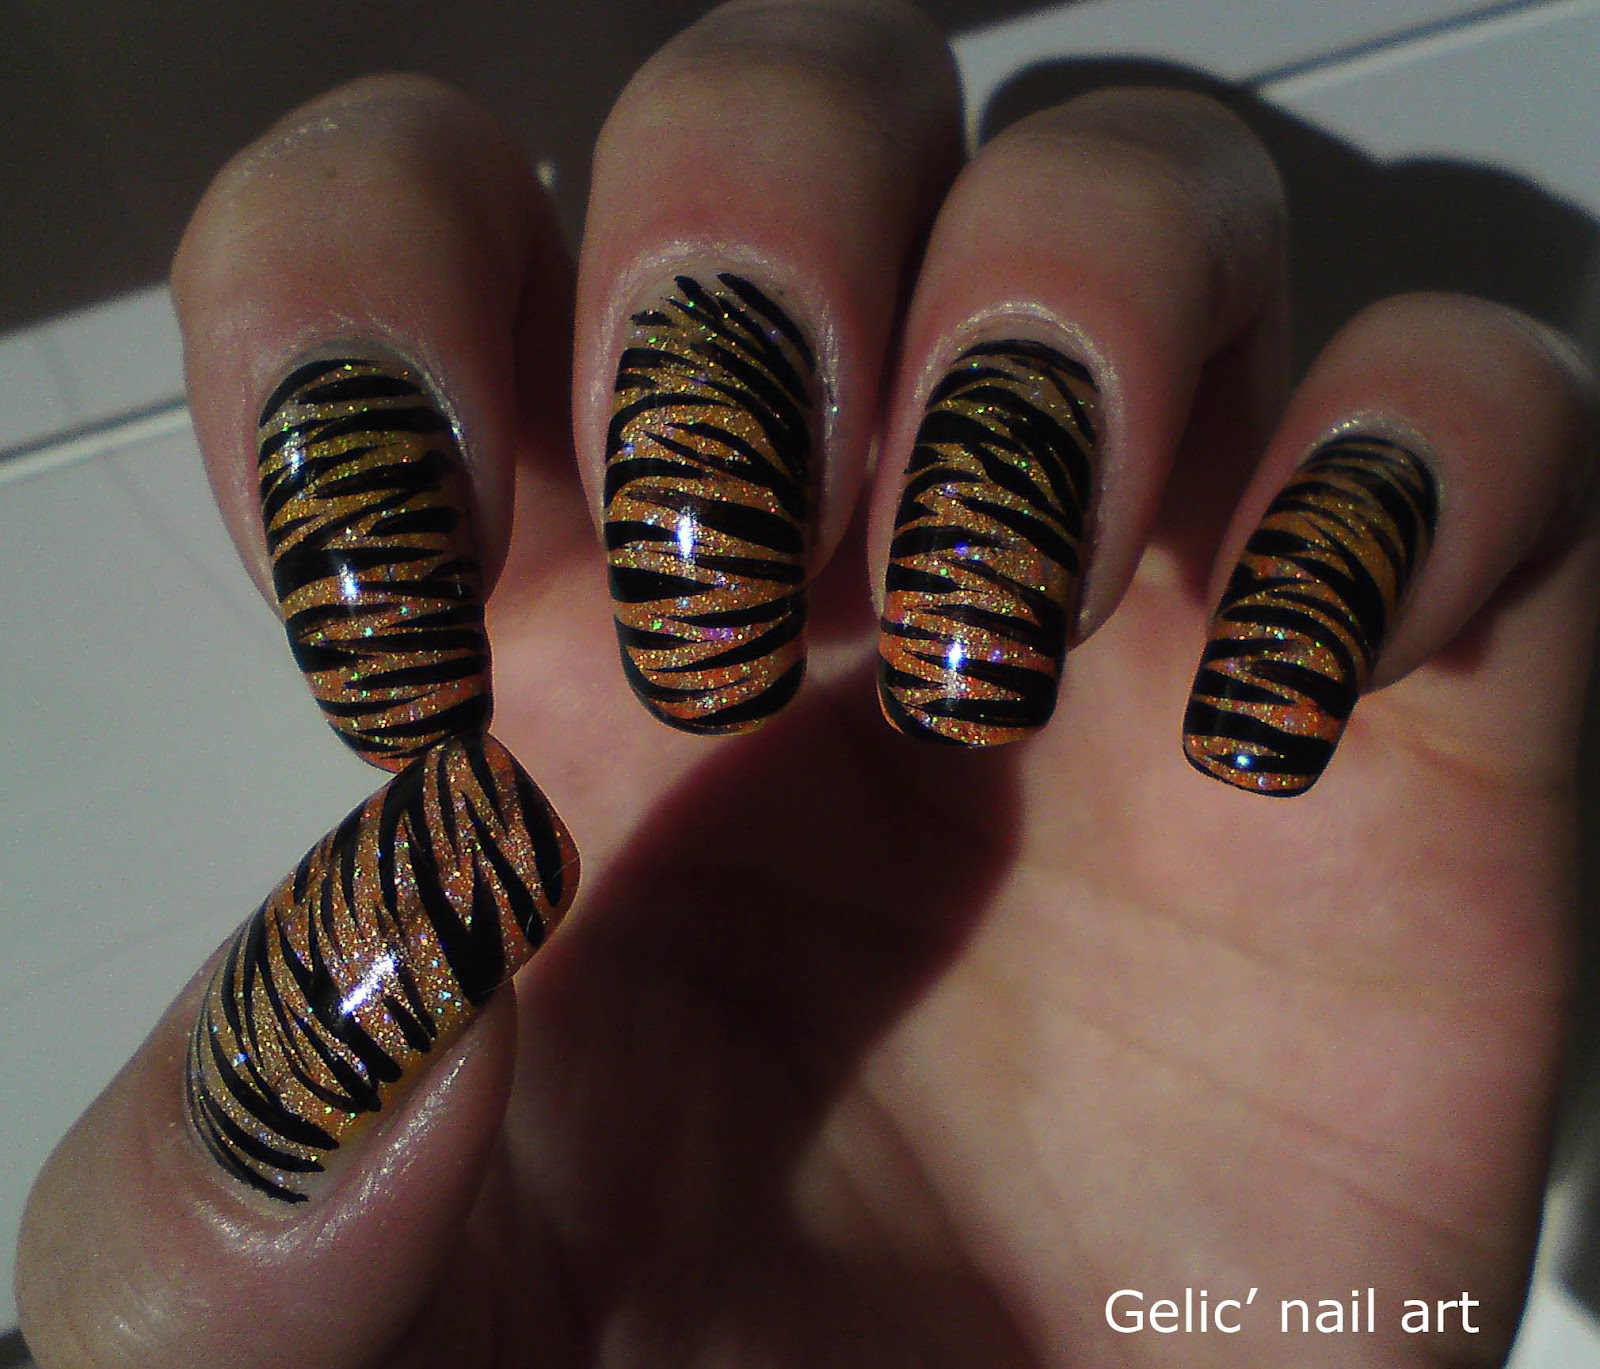 Gelic' Nail Art: Tiger Nail Art On Orange Neon Holo Gradient